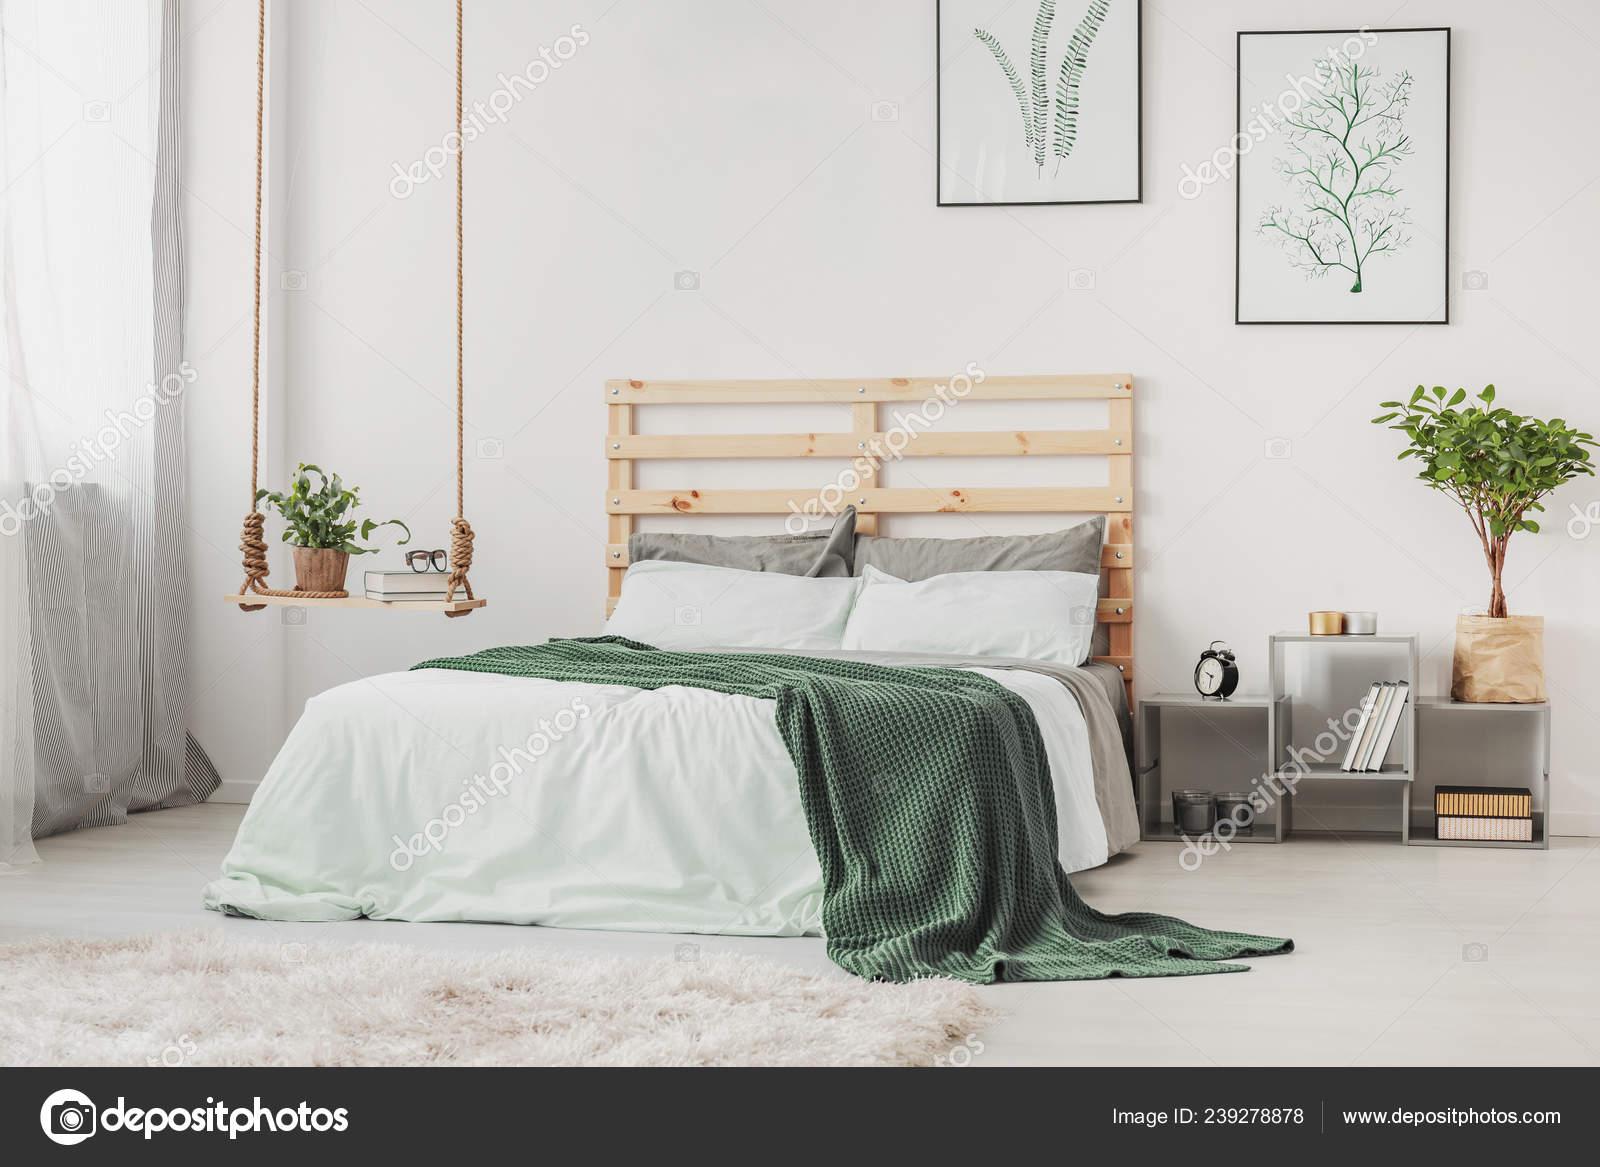 Scandinavian Bedroom Interior Comfortable Bed Grey White Bedding Minimal Posters Stock Photo Image By C Photographee Eu 239278878